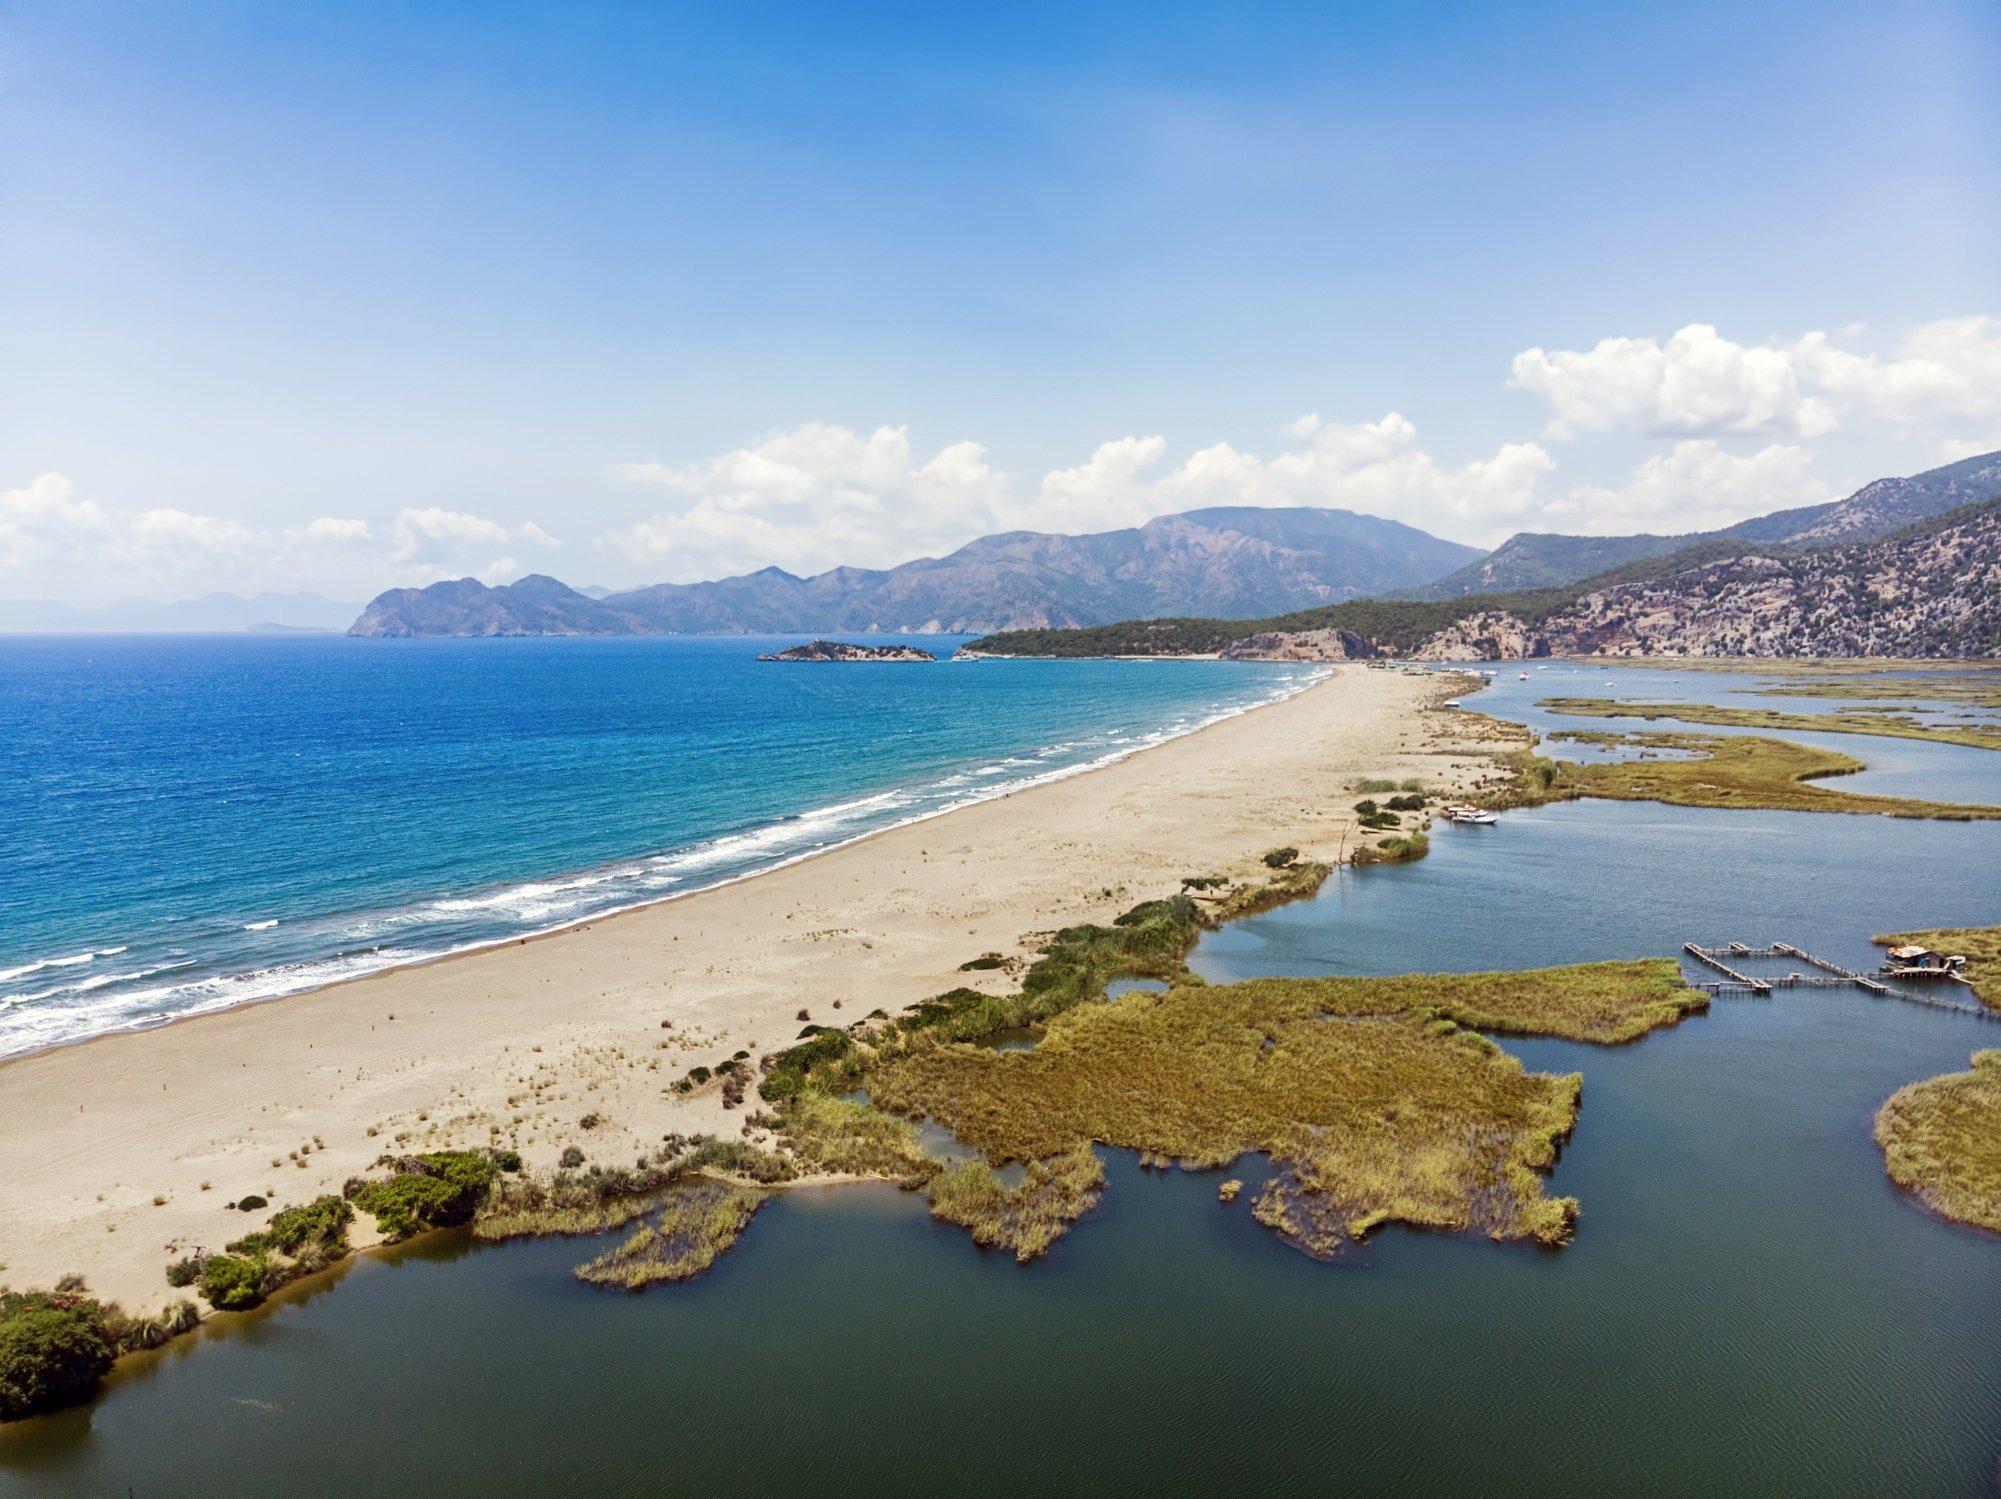 Home to Caretta carettas, many birds and fish, Dalyan's Iztuzu Beach is one of the most popular beaches in Turkey. (iStock Photo)